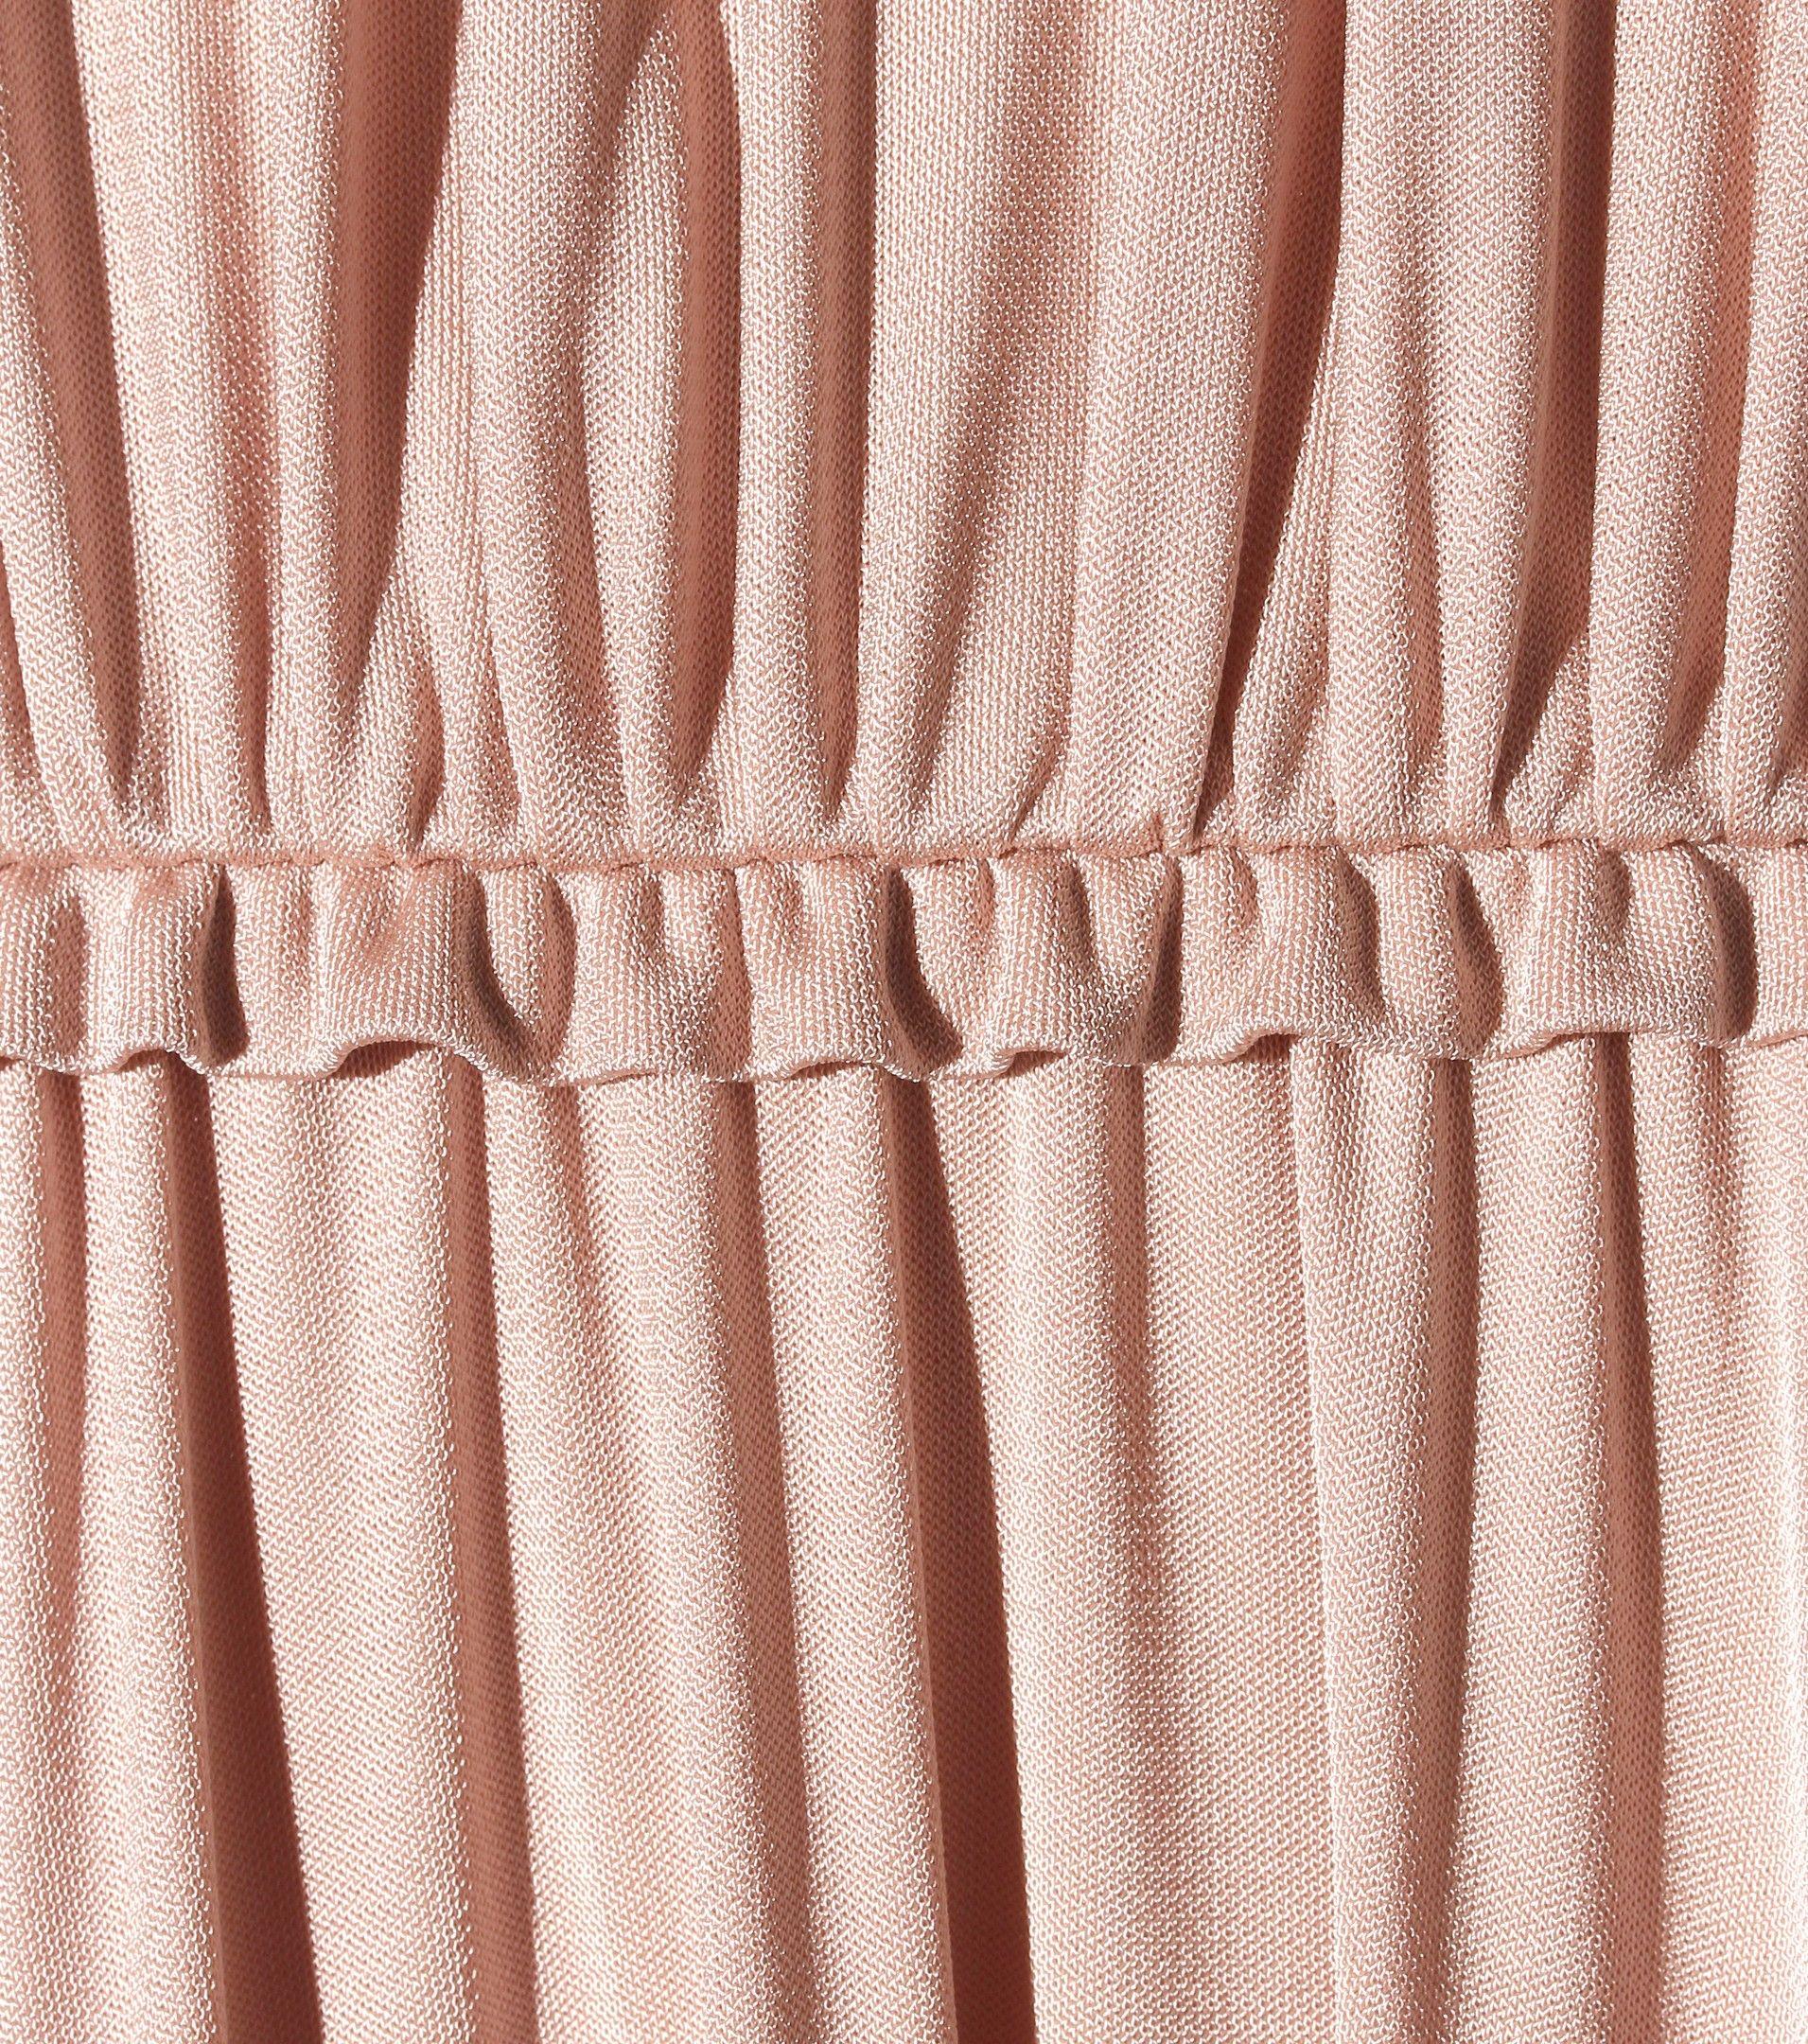 mytheresa.com - Jersey Dress - Valentino | mytheresa - Luxury Fashion for Women / Designer clothing, shoes, bags